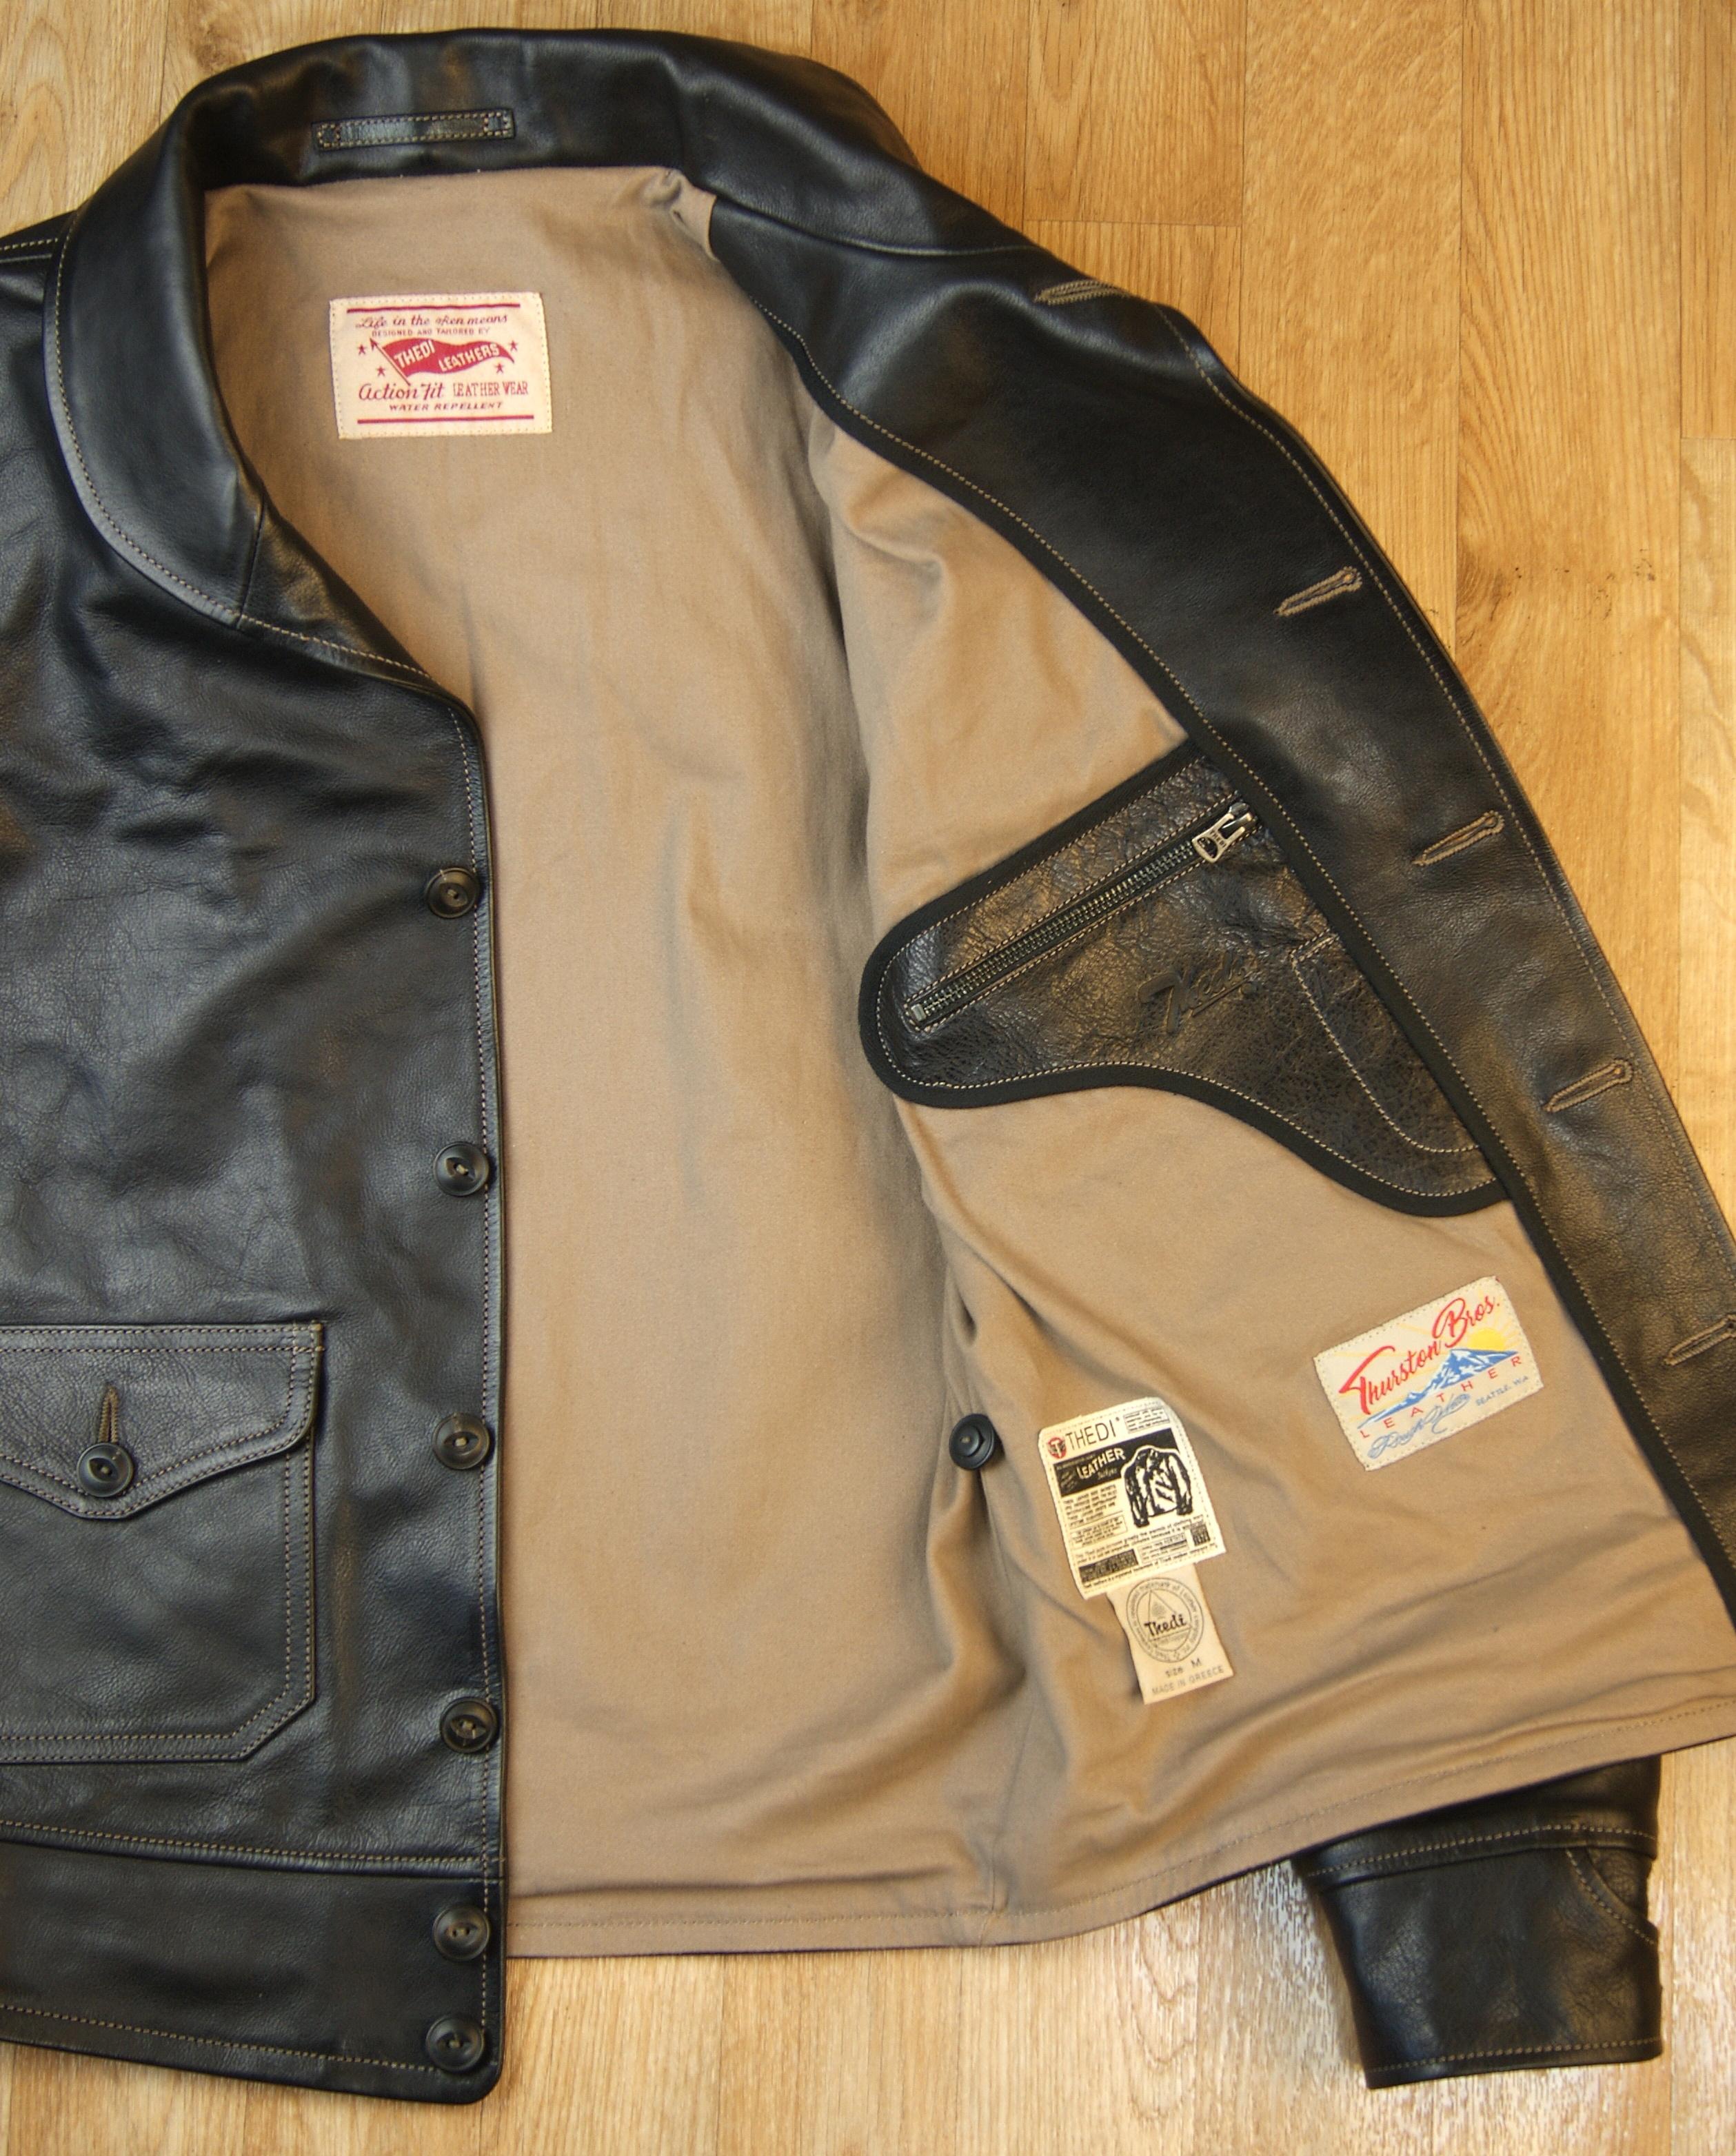 Thedi Shawl Collar Black Buffalo THS10 tan lining.jpg